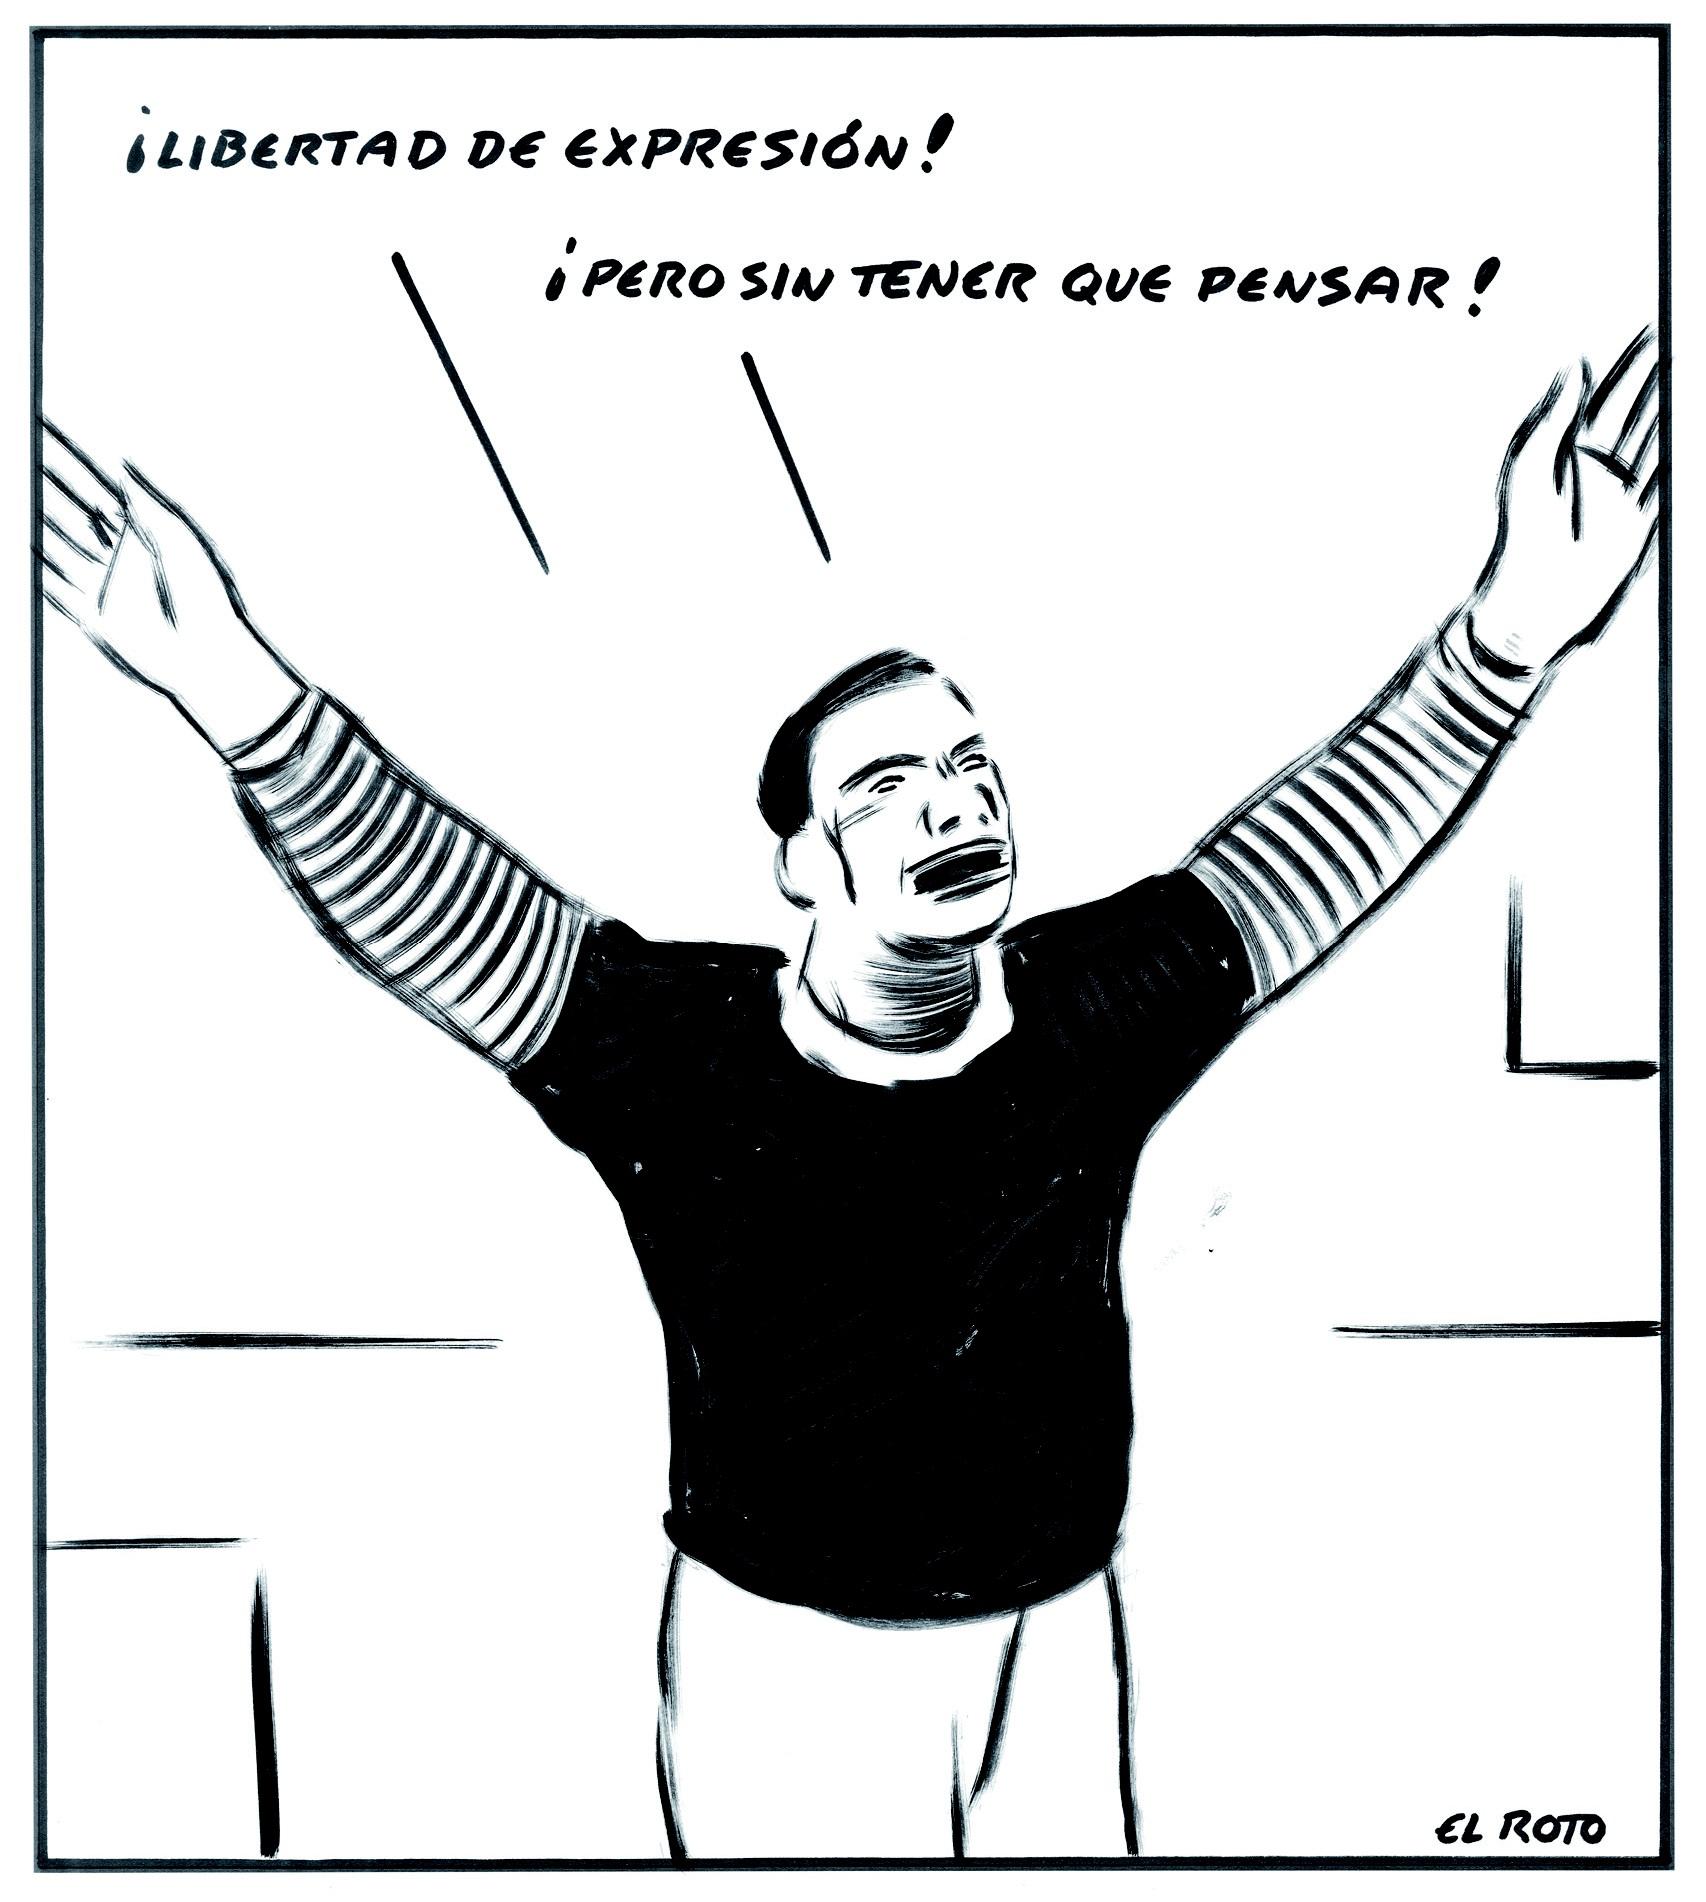 El-Roto_Ilustracion